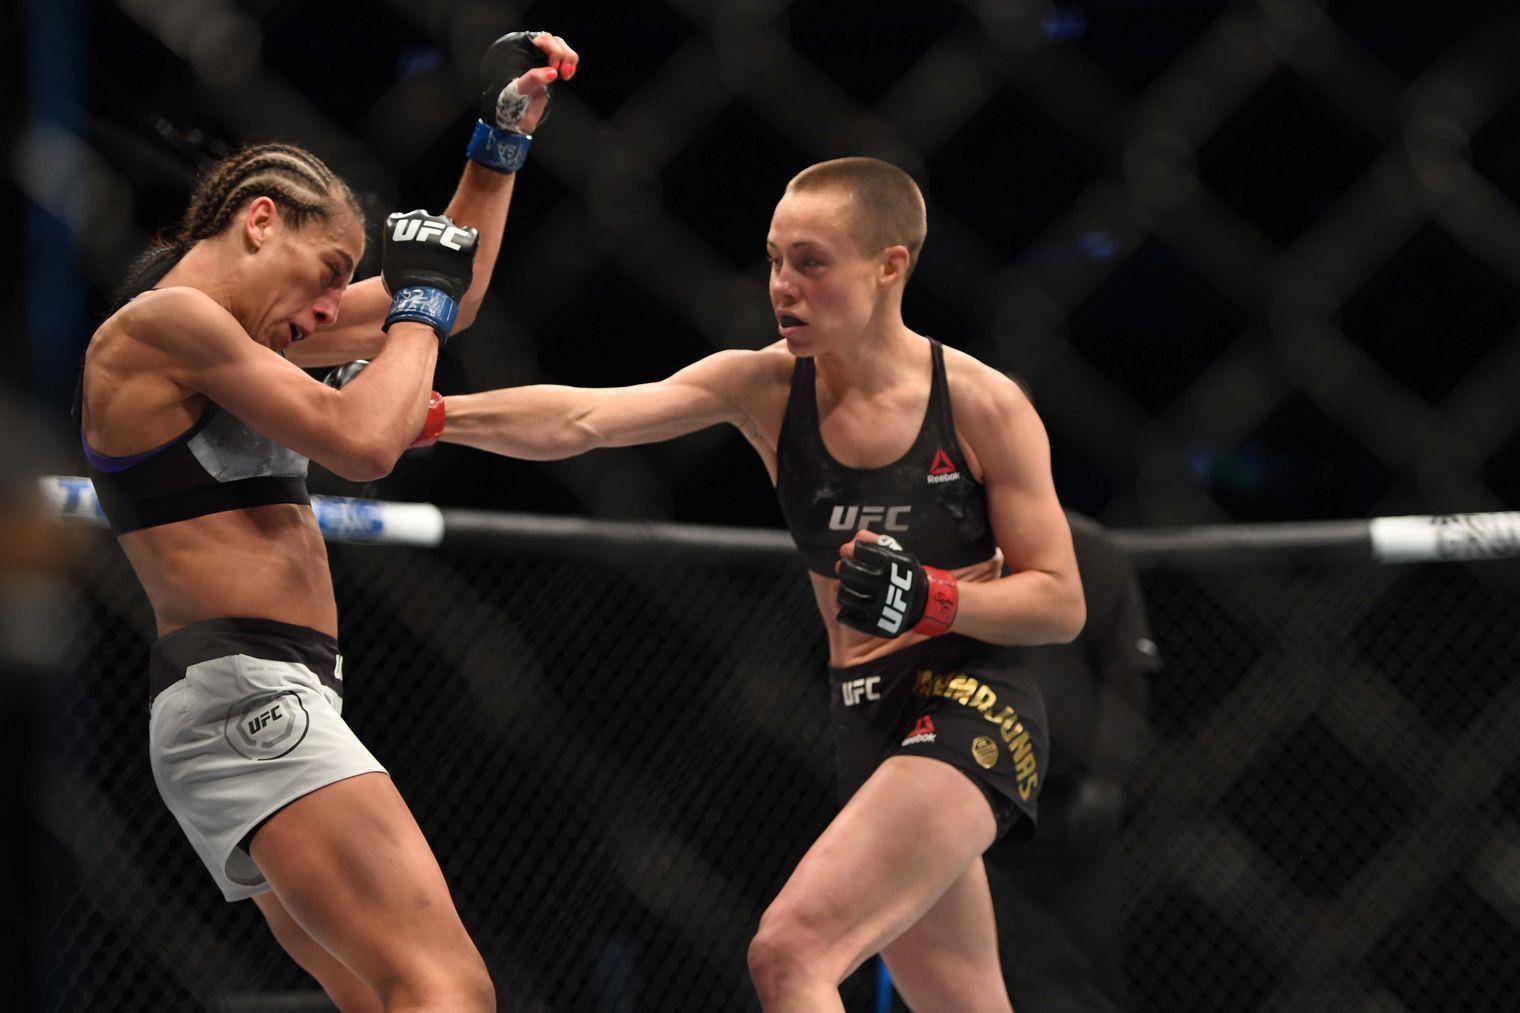 Rose Namajunas : She did it again   mma   Rose namajunas, Women boxing, Ufc fighters